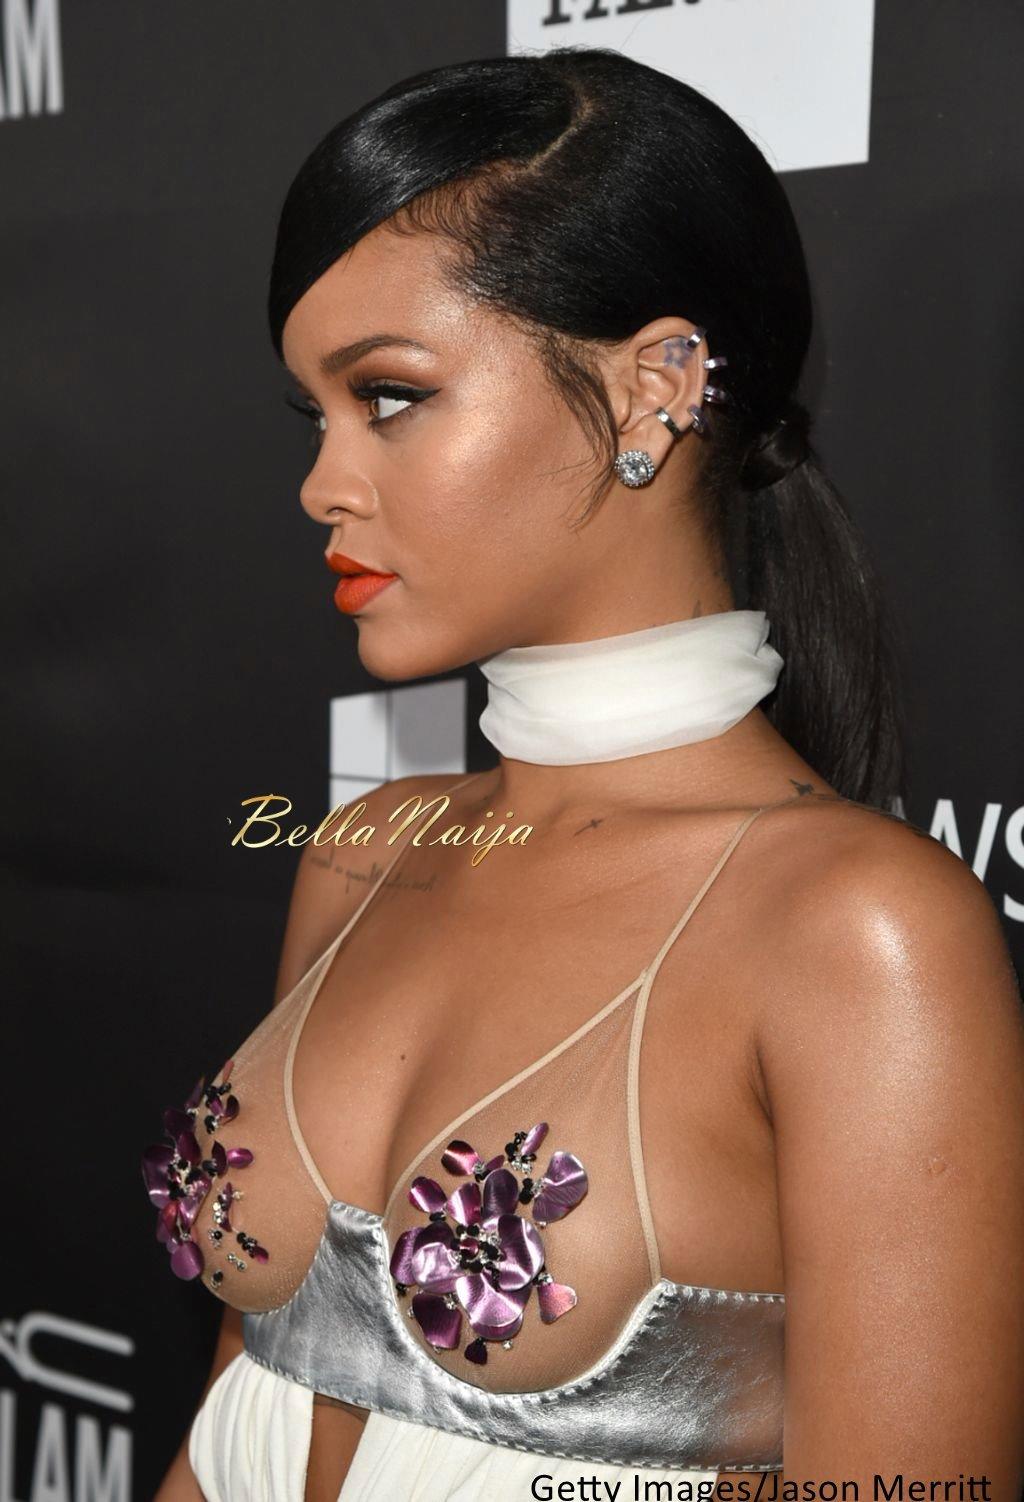 Rihanna - BellaNaija - September 2015_001